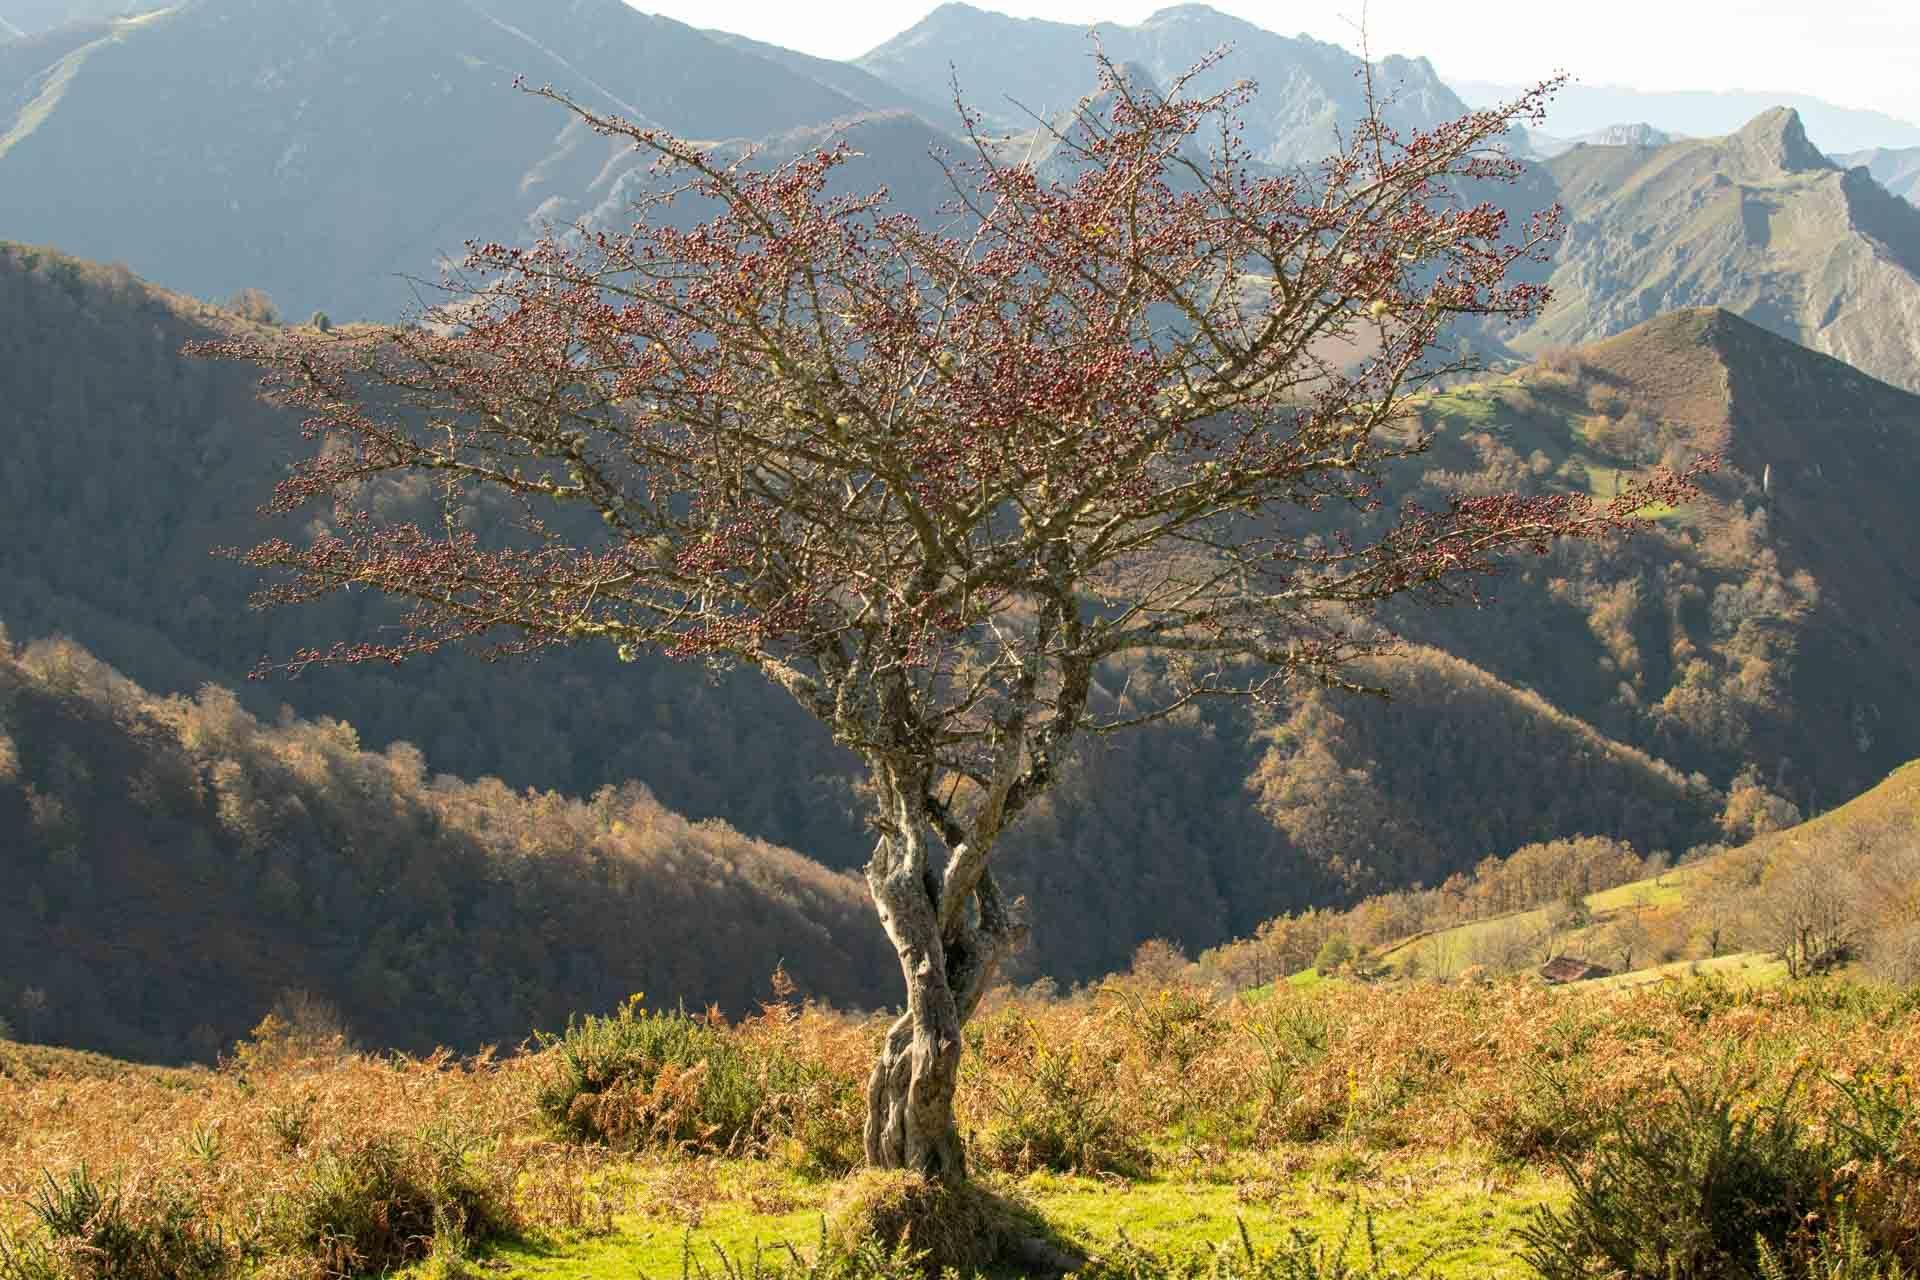 Paisaje de montaña en Parque Natural de Redes